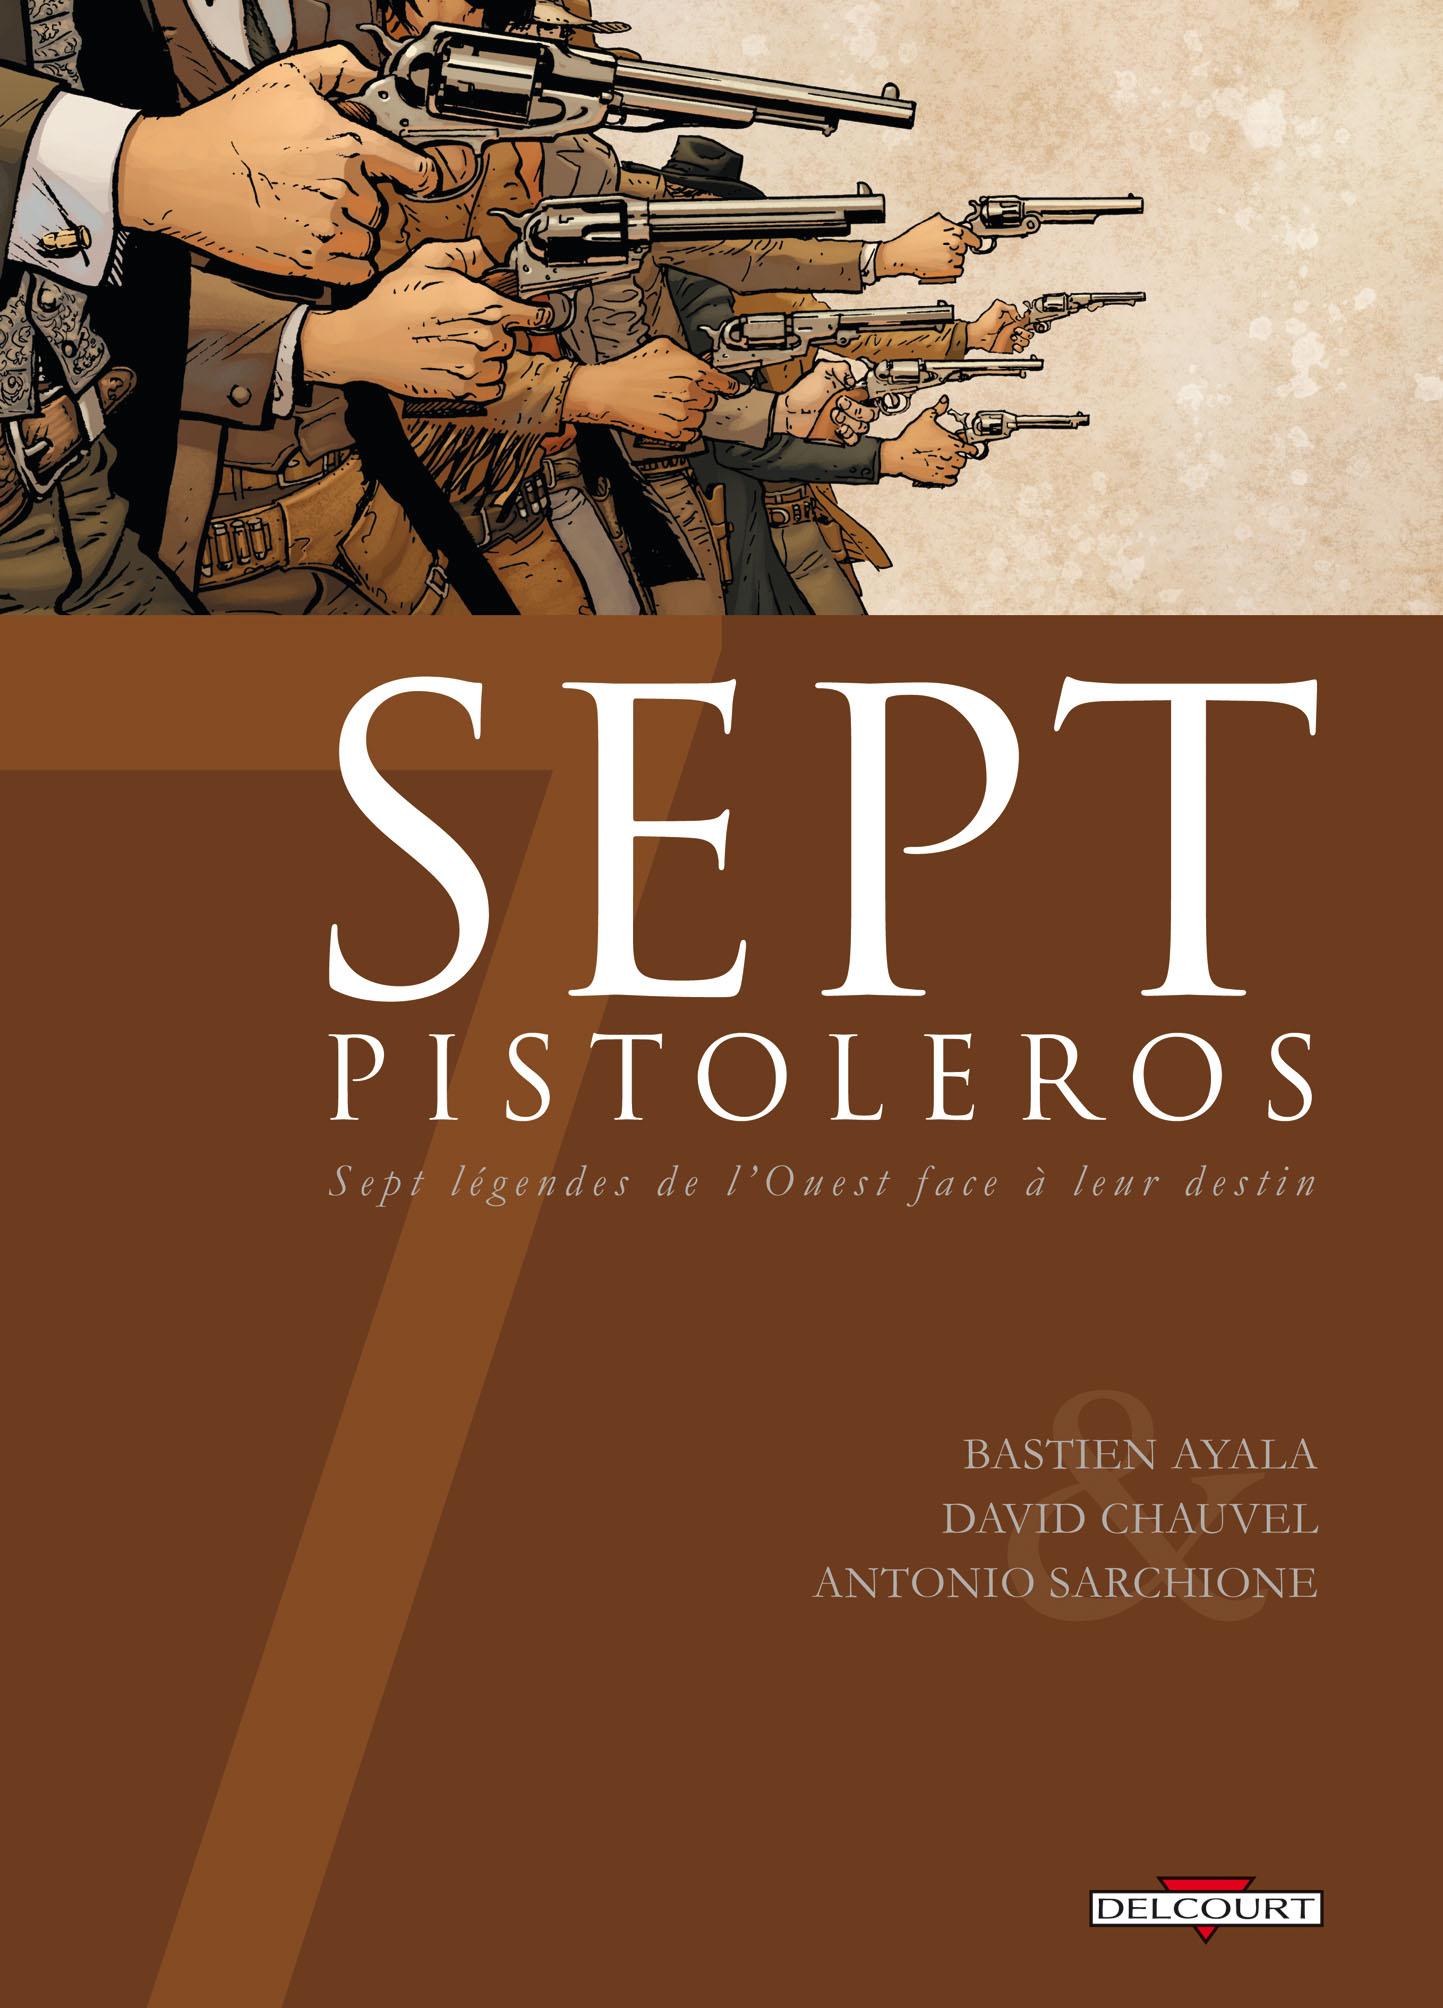 Sept 14 - 7 pistoleros